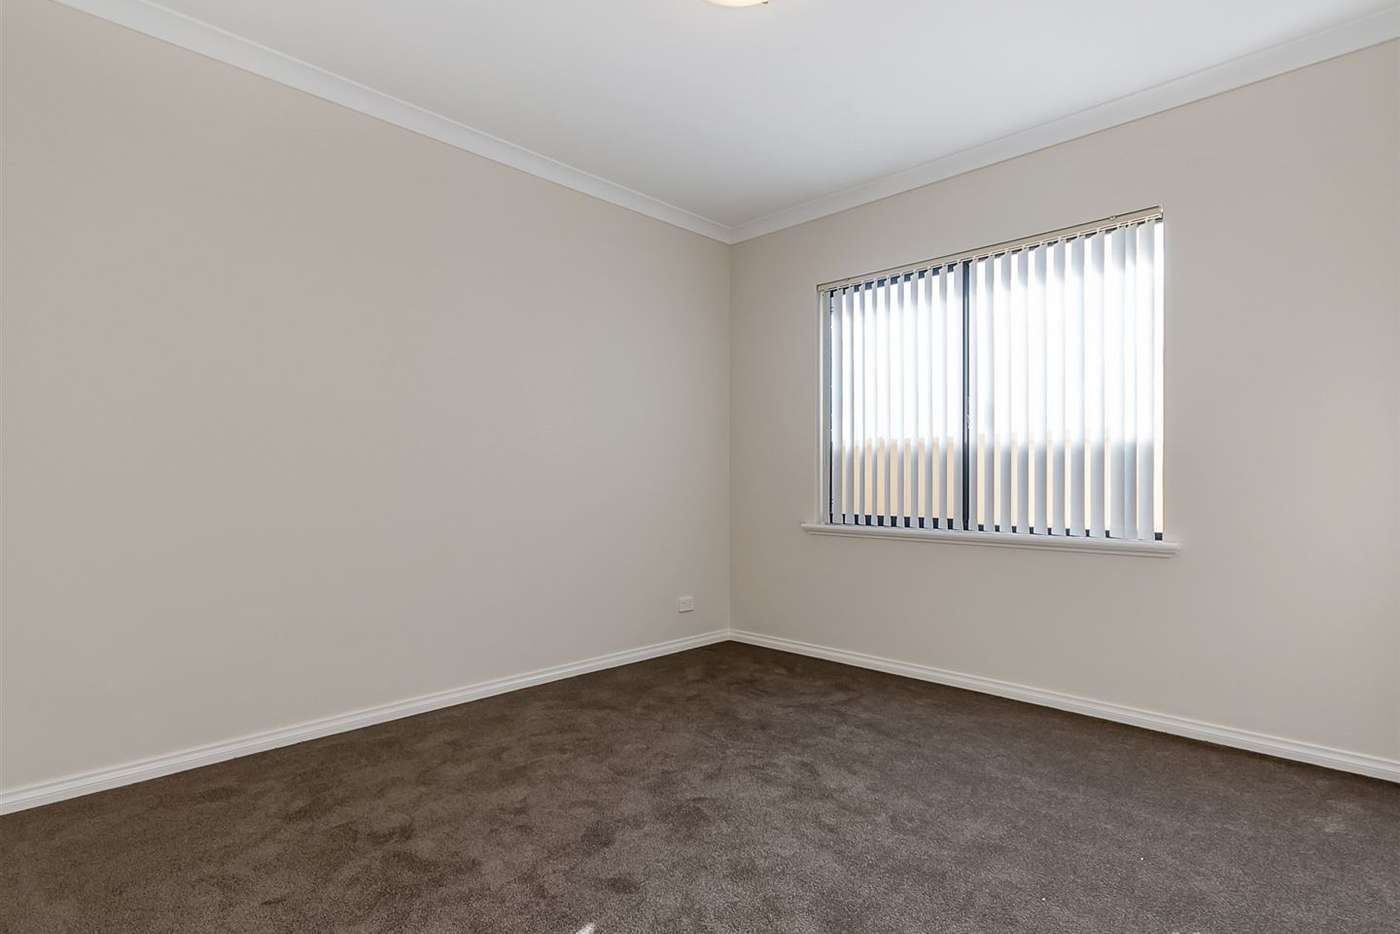 Seventh view of Homely unit listing, 5/157 Kinross Drive, Kinross WA 6028